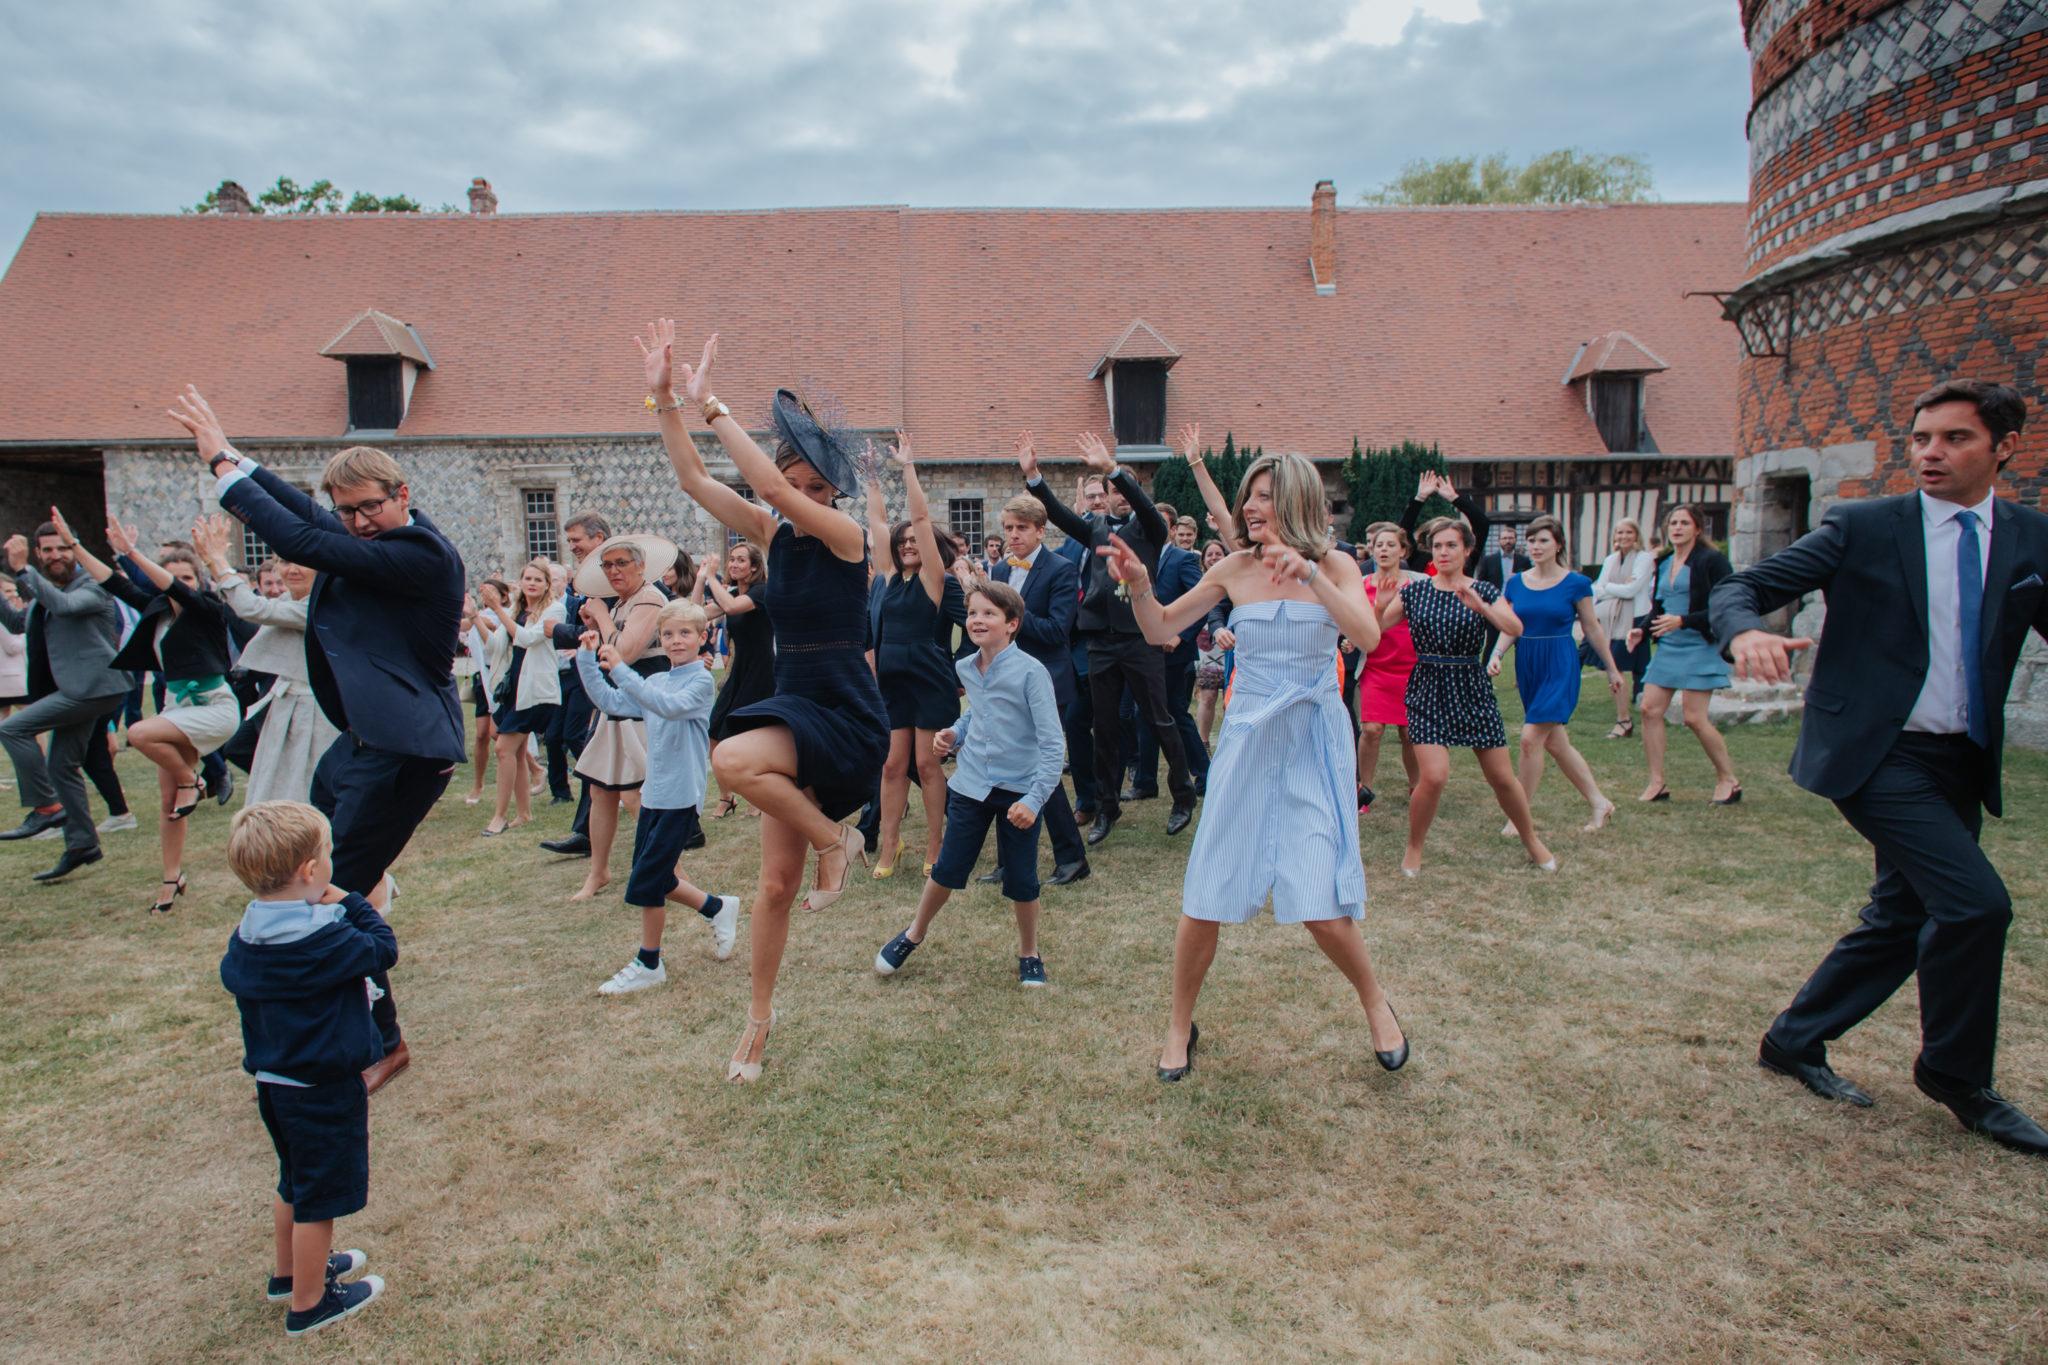 Flashmob danse ambiance cocktail Manoir Ango Varengeville sur Mer